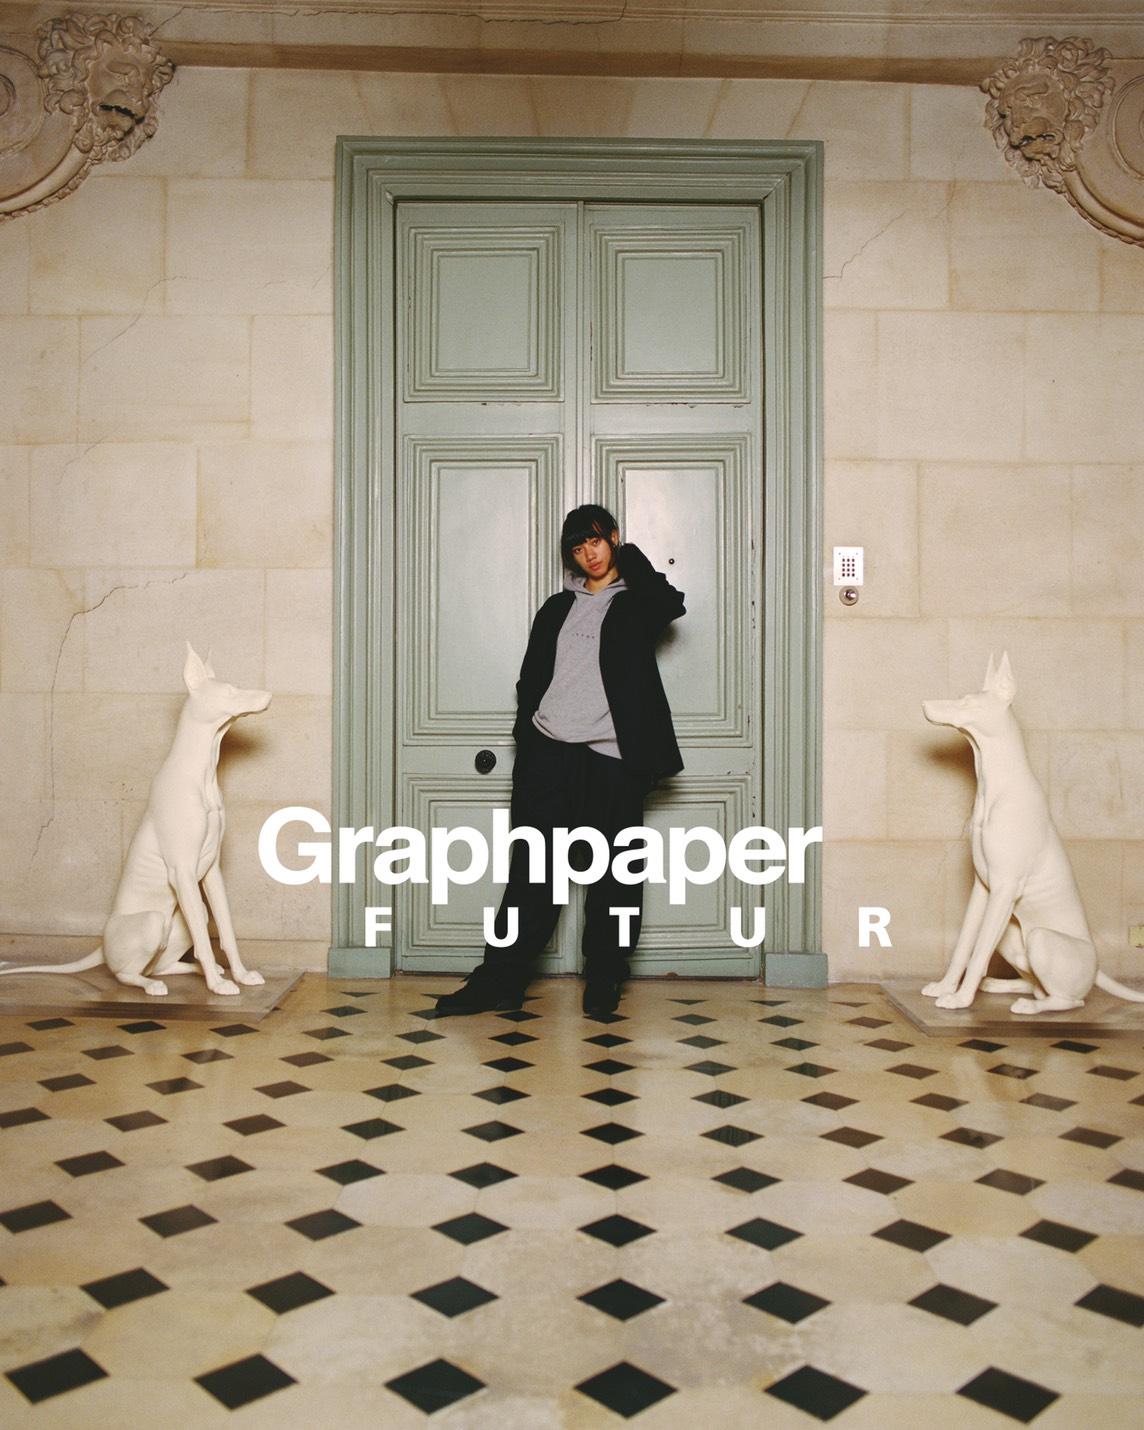 FUTUR × Graphpaper<br>カプセルコレクション登場